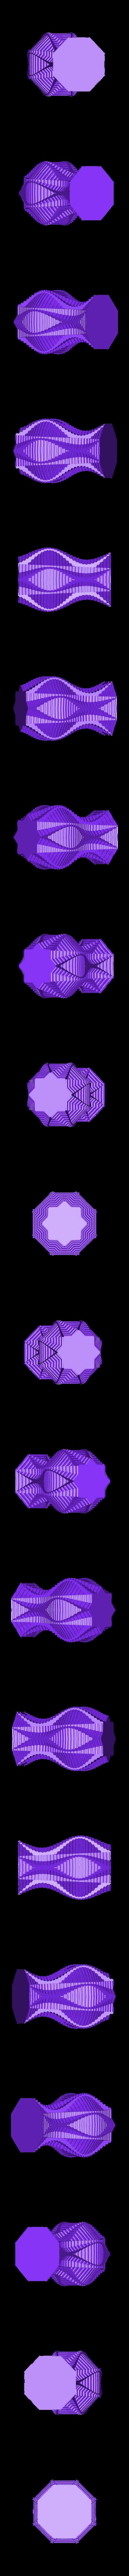 vase_exp_A.stl Download free STL file Reasonable Vases • 3D printer design, Zippityboomba